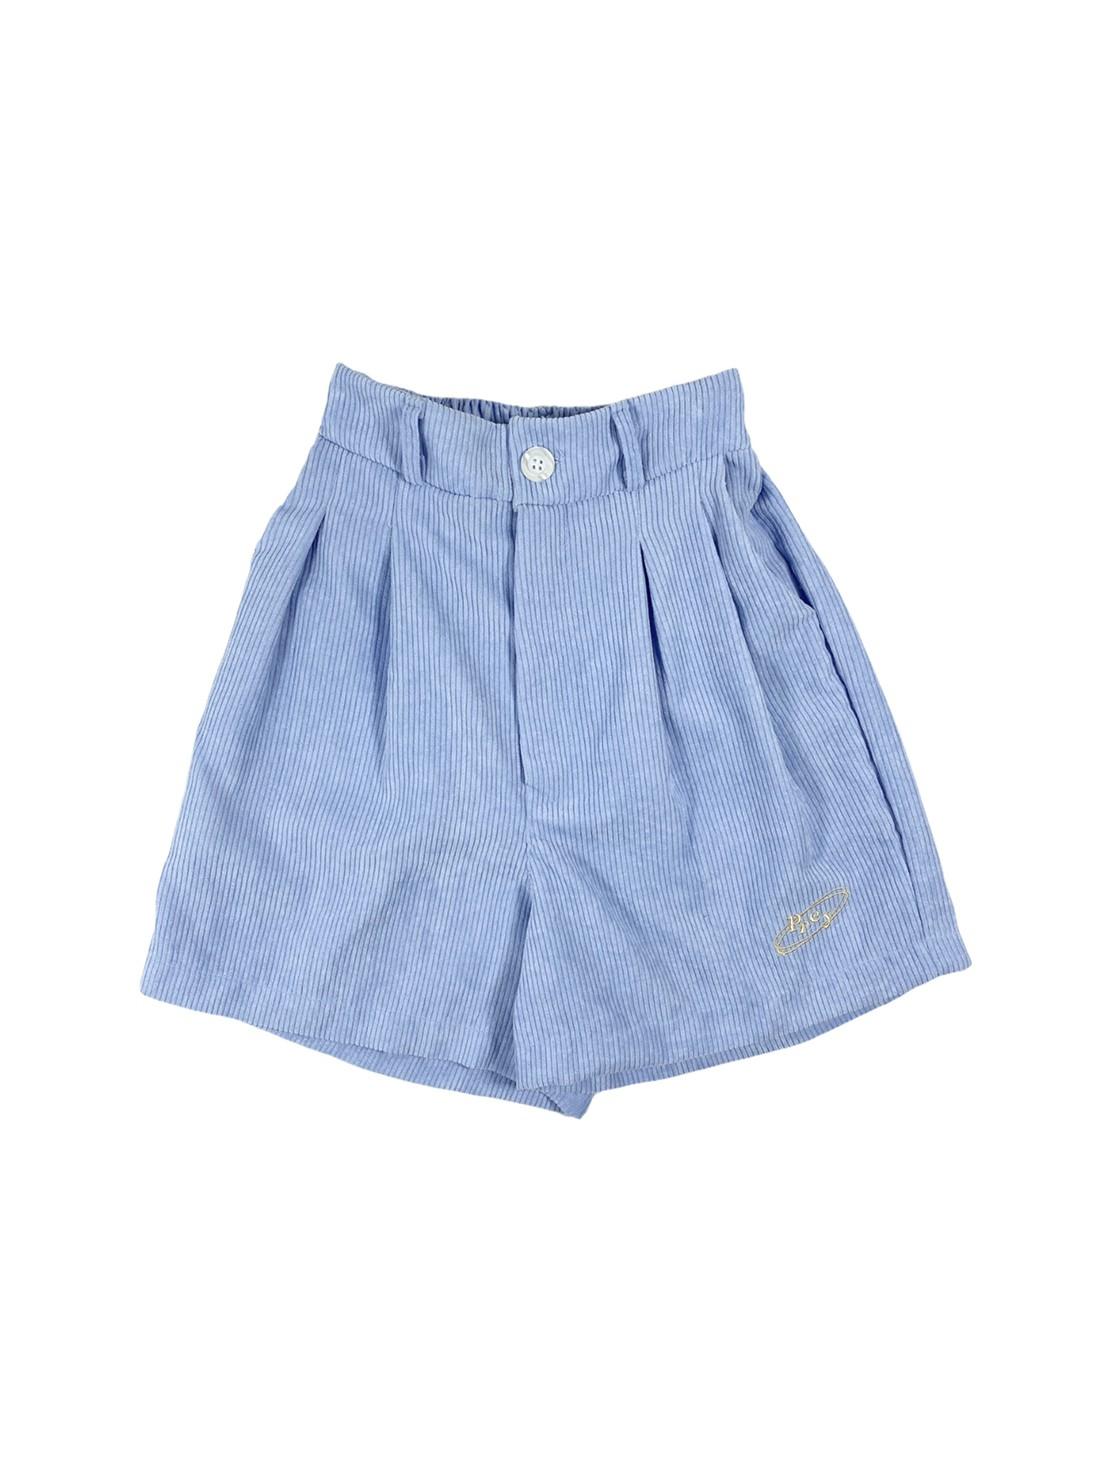 Prey Baby Corduroy Shorts (Light Blue)